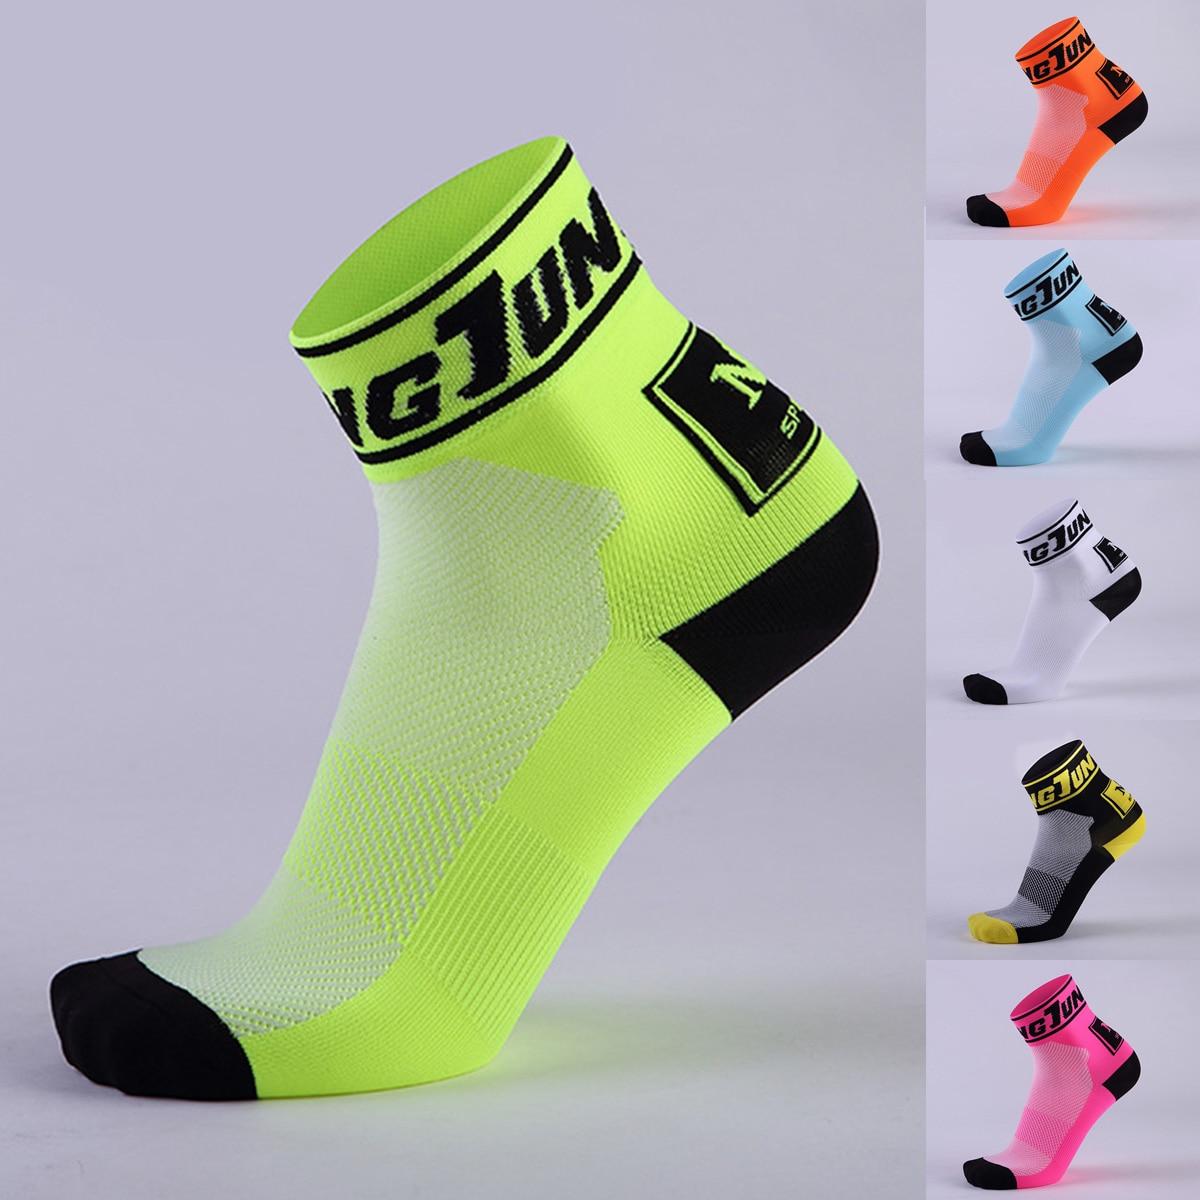 Unisex Men's Short Sport Socks Cycling Climbing Hiking Running Socks Quick Dry Socks Antiskid Outdoor Bicycle Cycling Socks